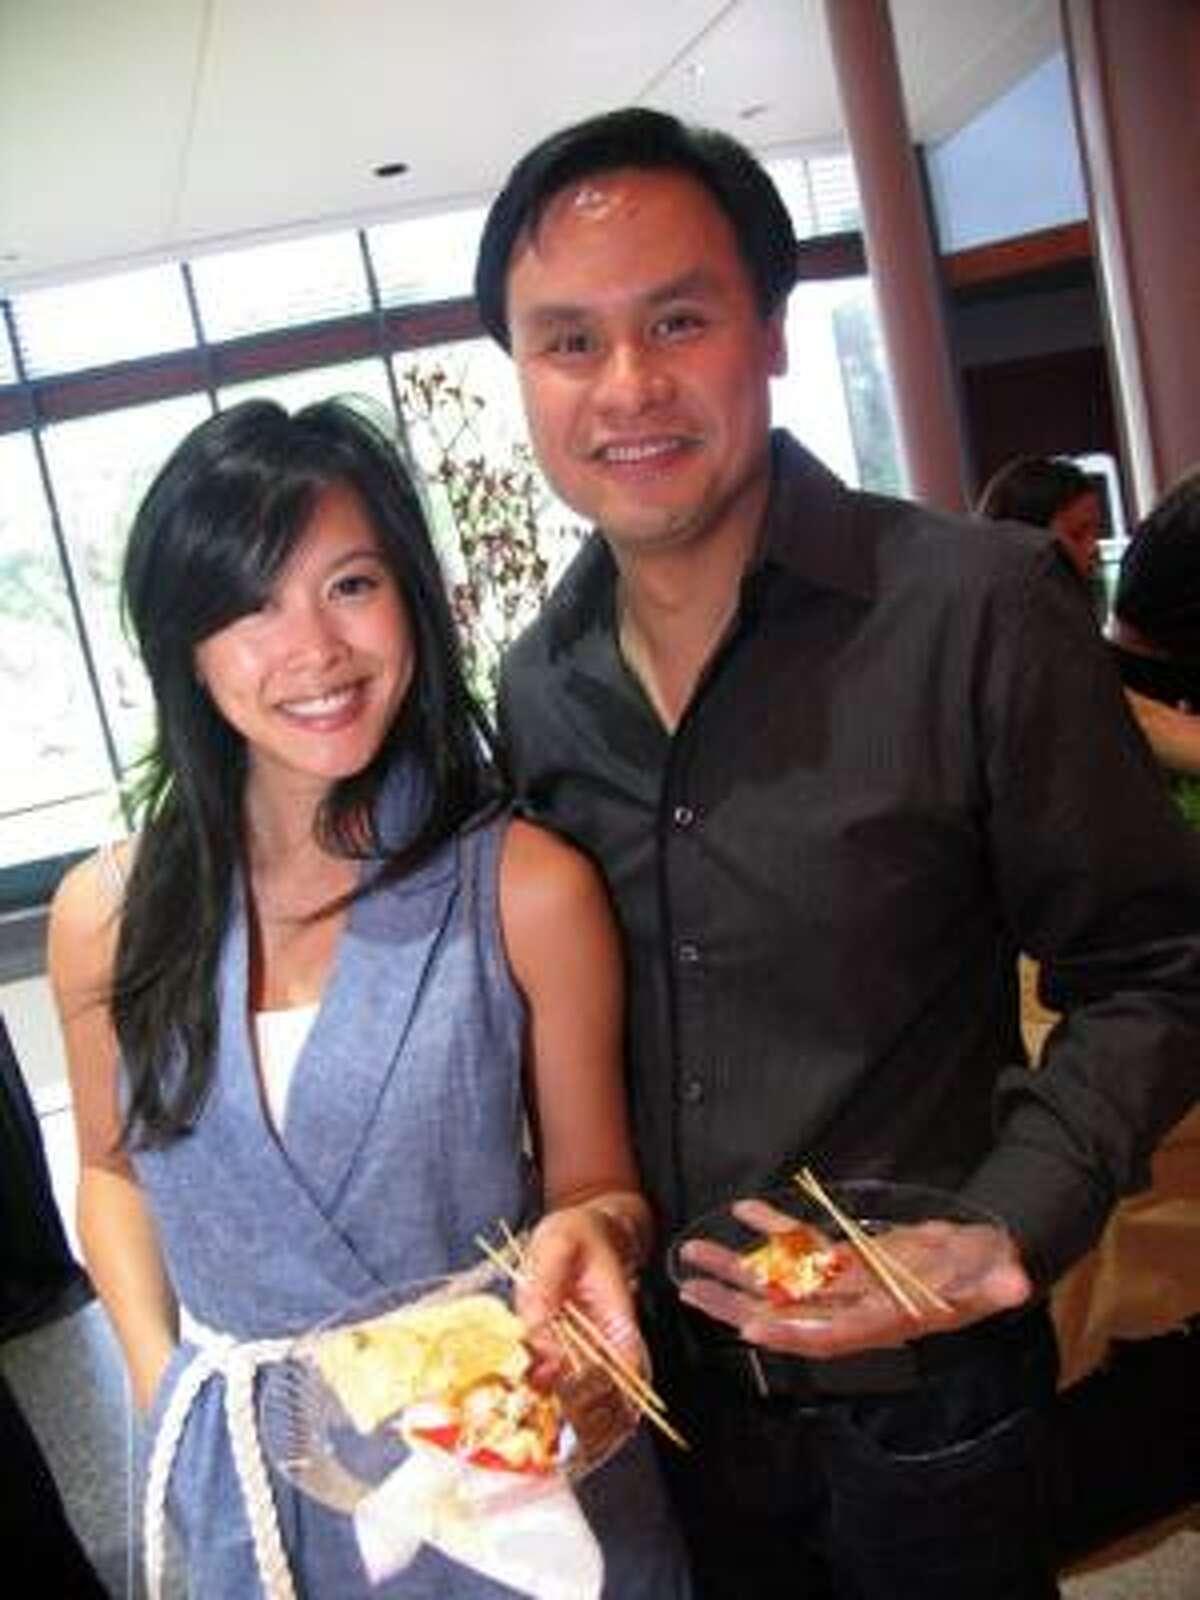 Christina Nguyen, left, and Danny Vu